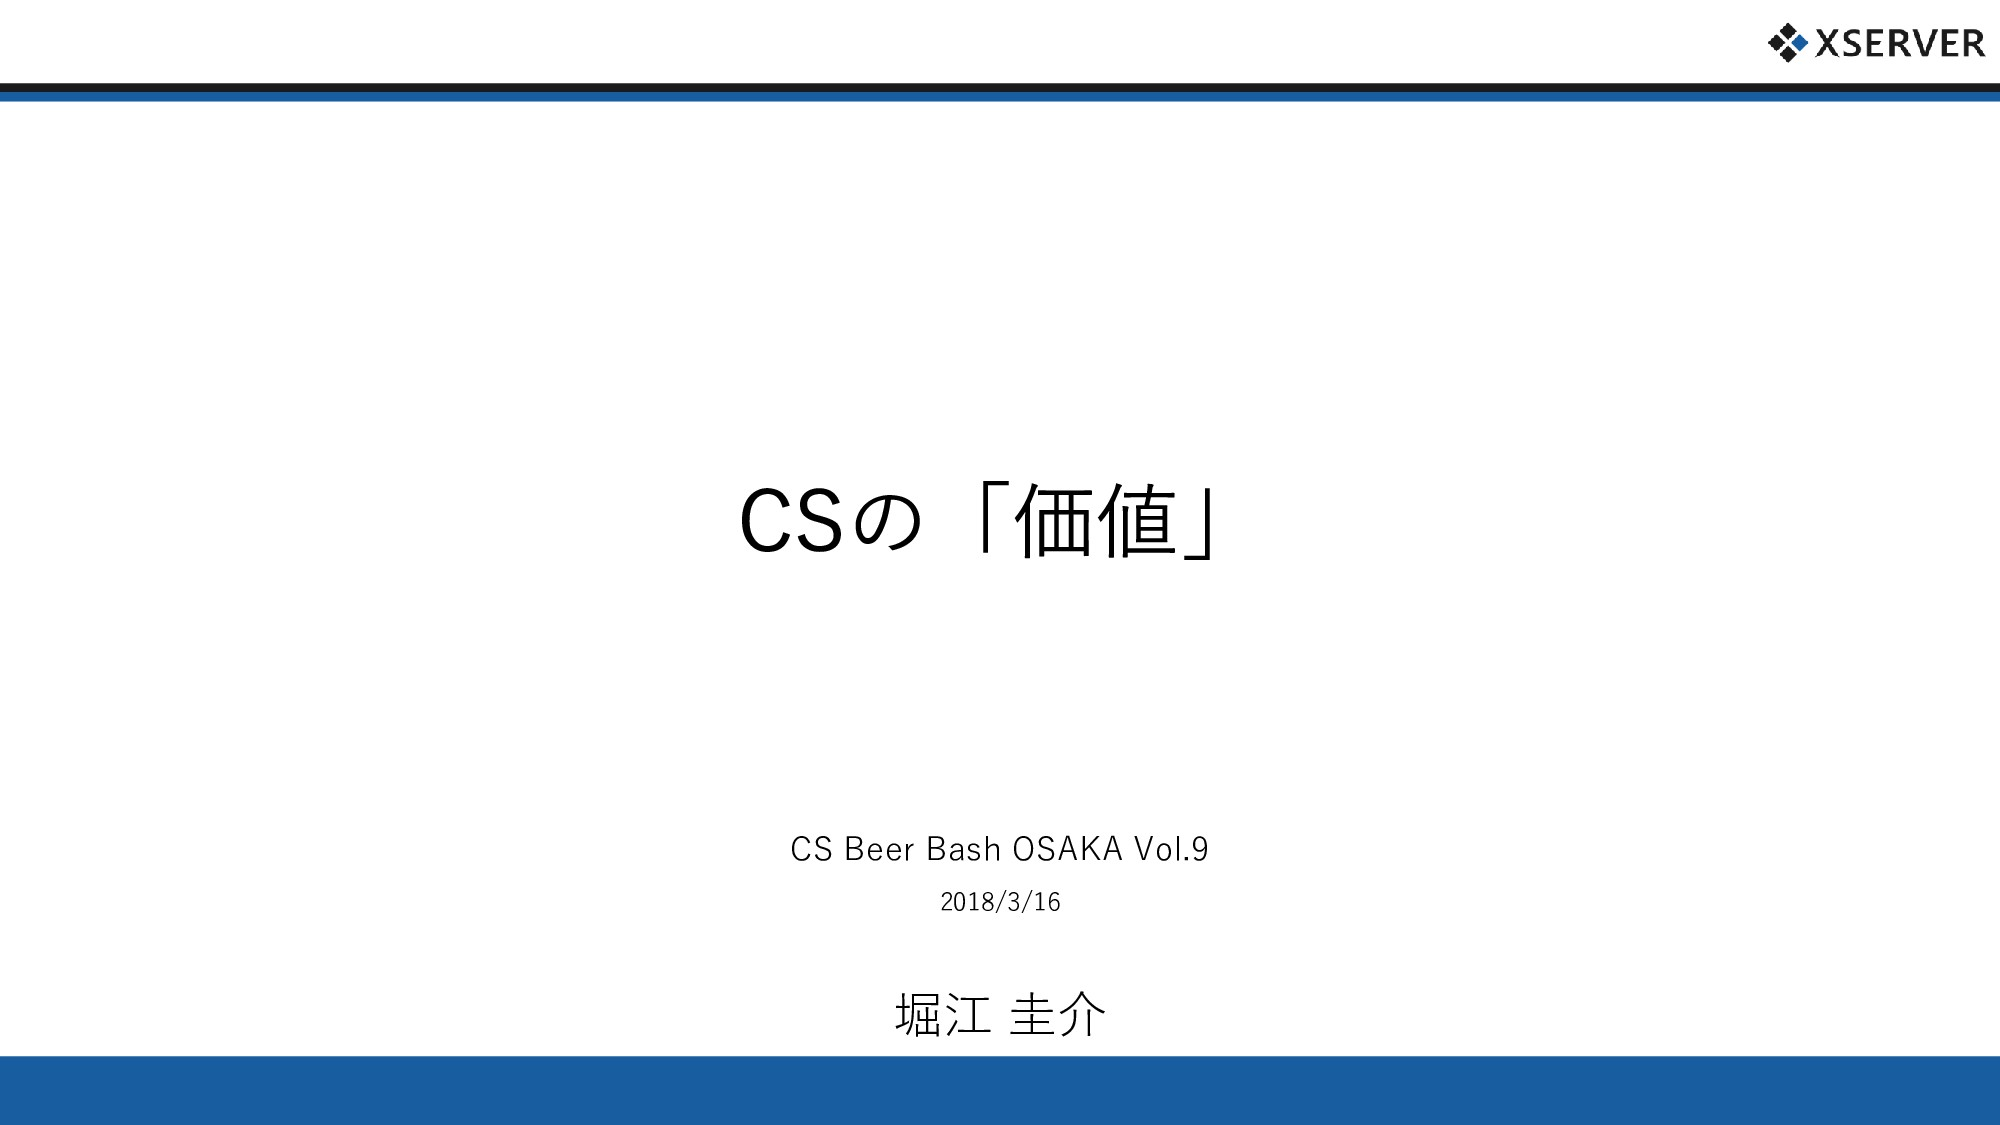 CSの「価値」 CS Beer Bash OSAKA Vol.9 2018/3/16 堀江 圭介